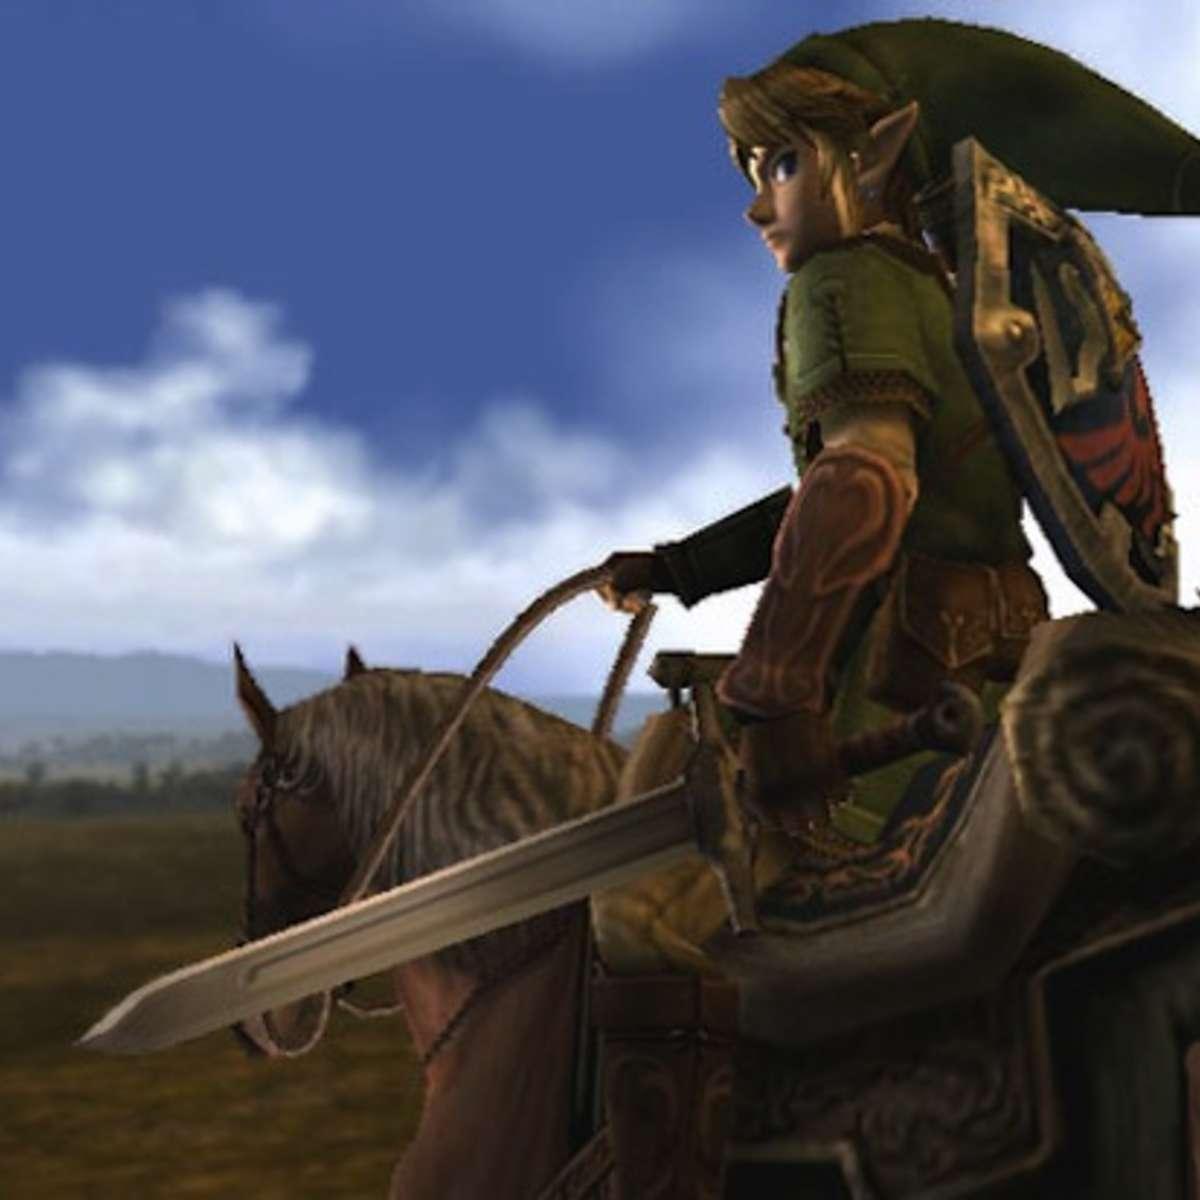 legend-of-zelda-link-epona-master-sword_0.jpg